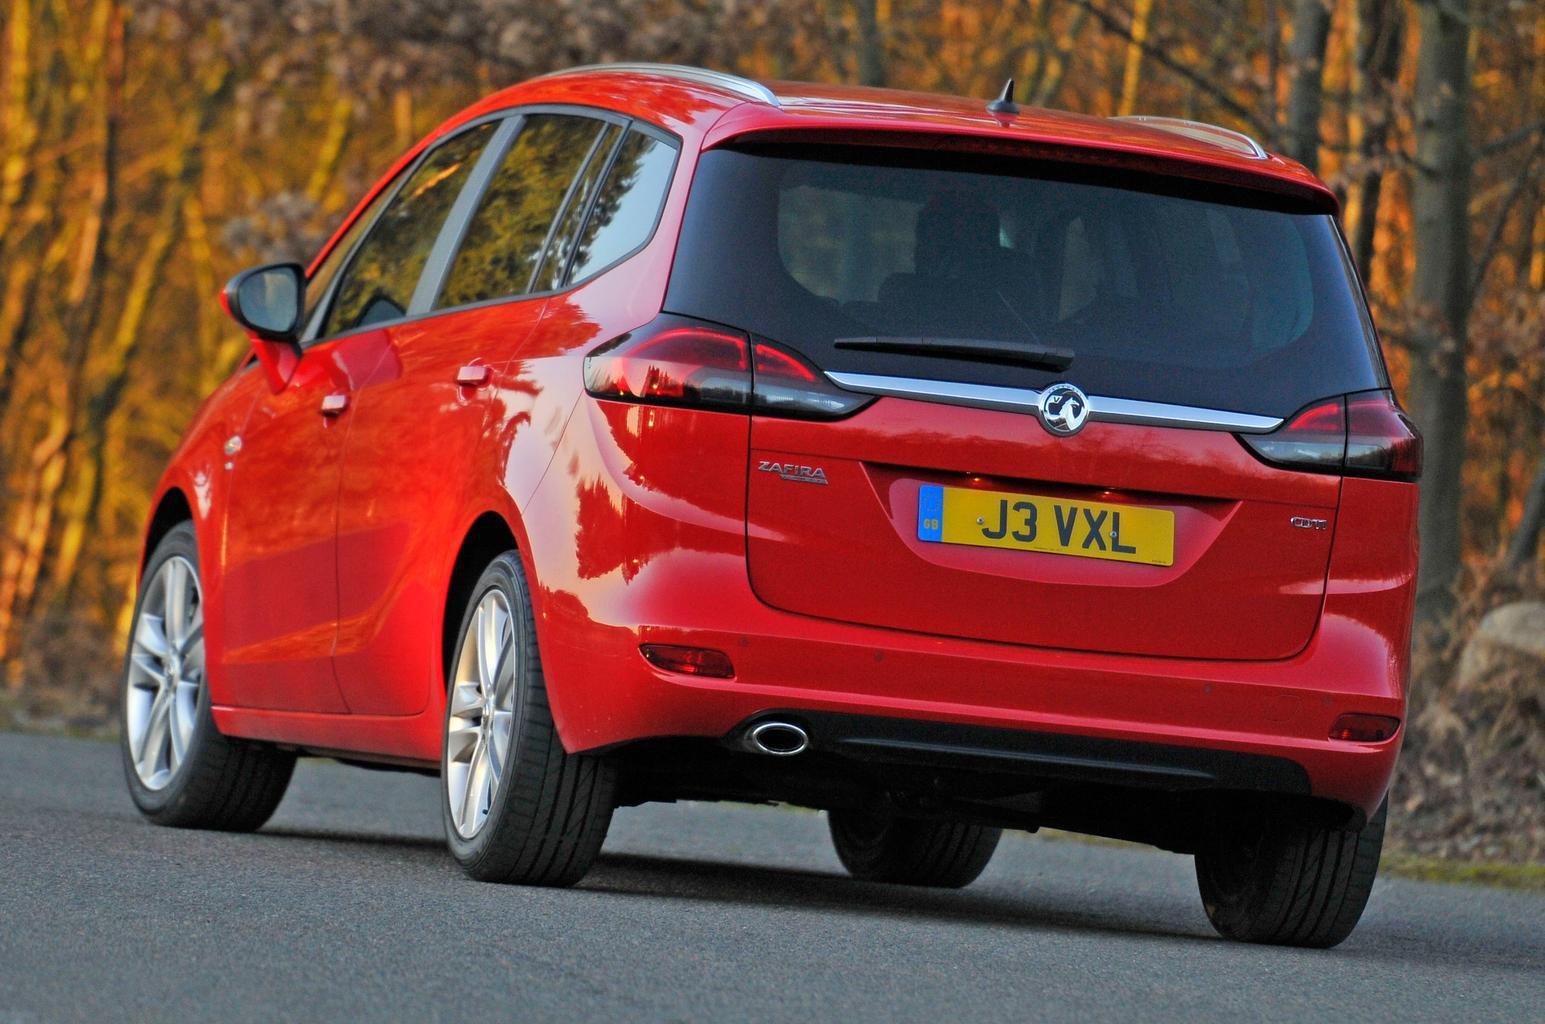 Used 7-seater MPVs tested: Ford S-Max vs Seat Alhambra vs Vauxhall Zafira Tourer